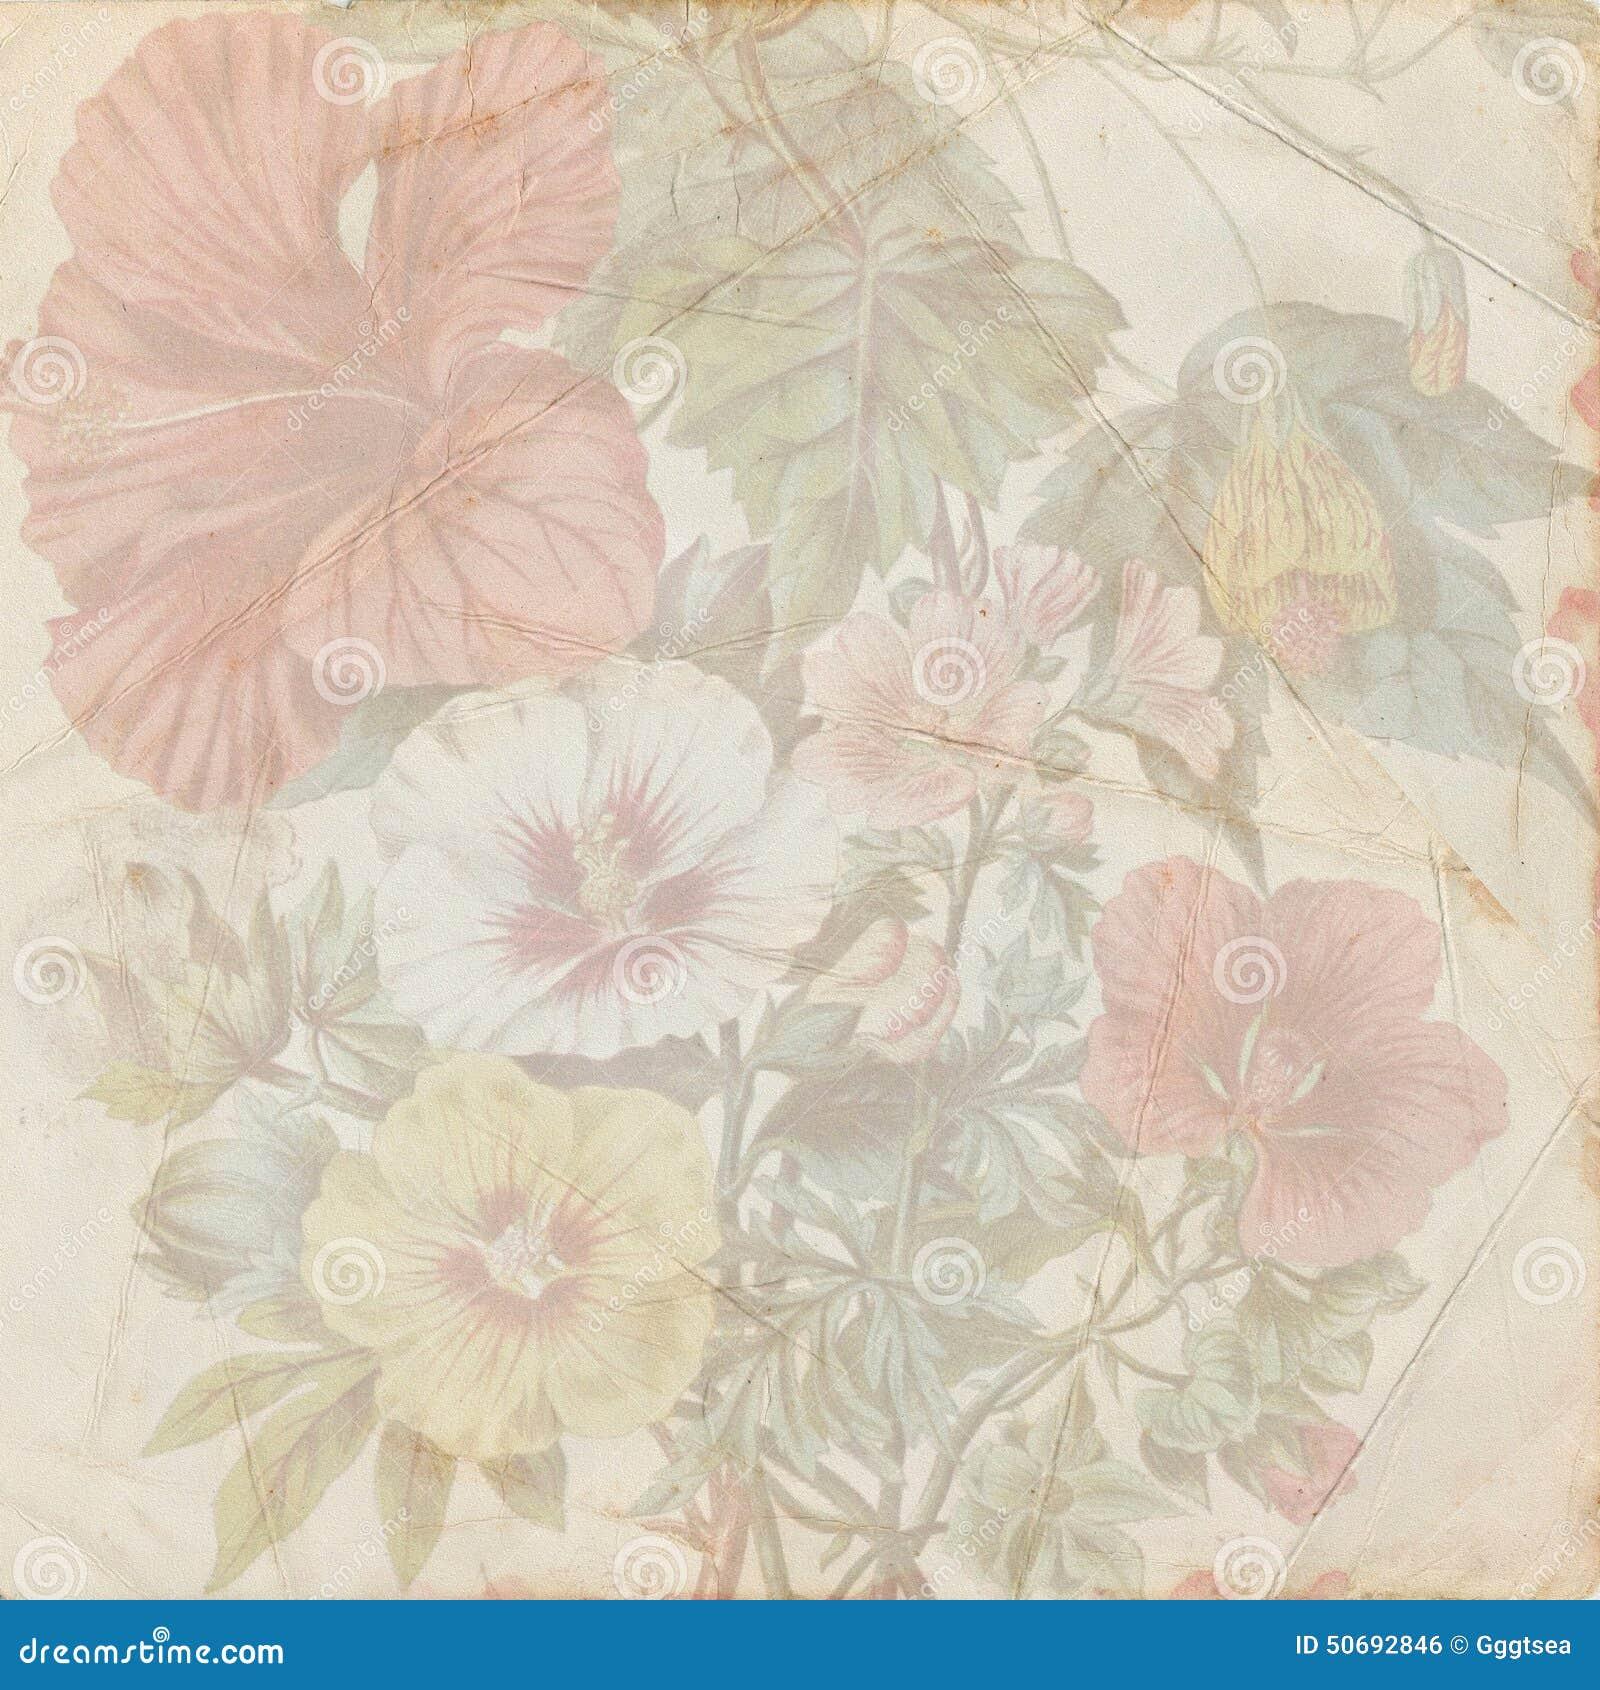 Vintage shabby flower paper texture stock illustration vintage shabby flower paper texture mightylinksfo